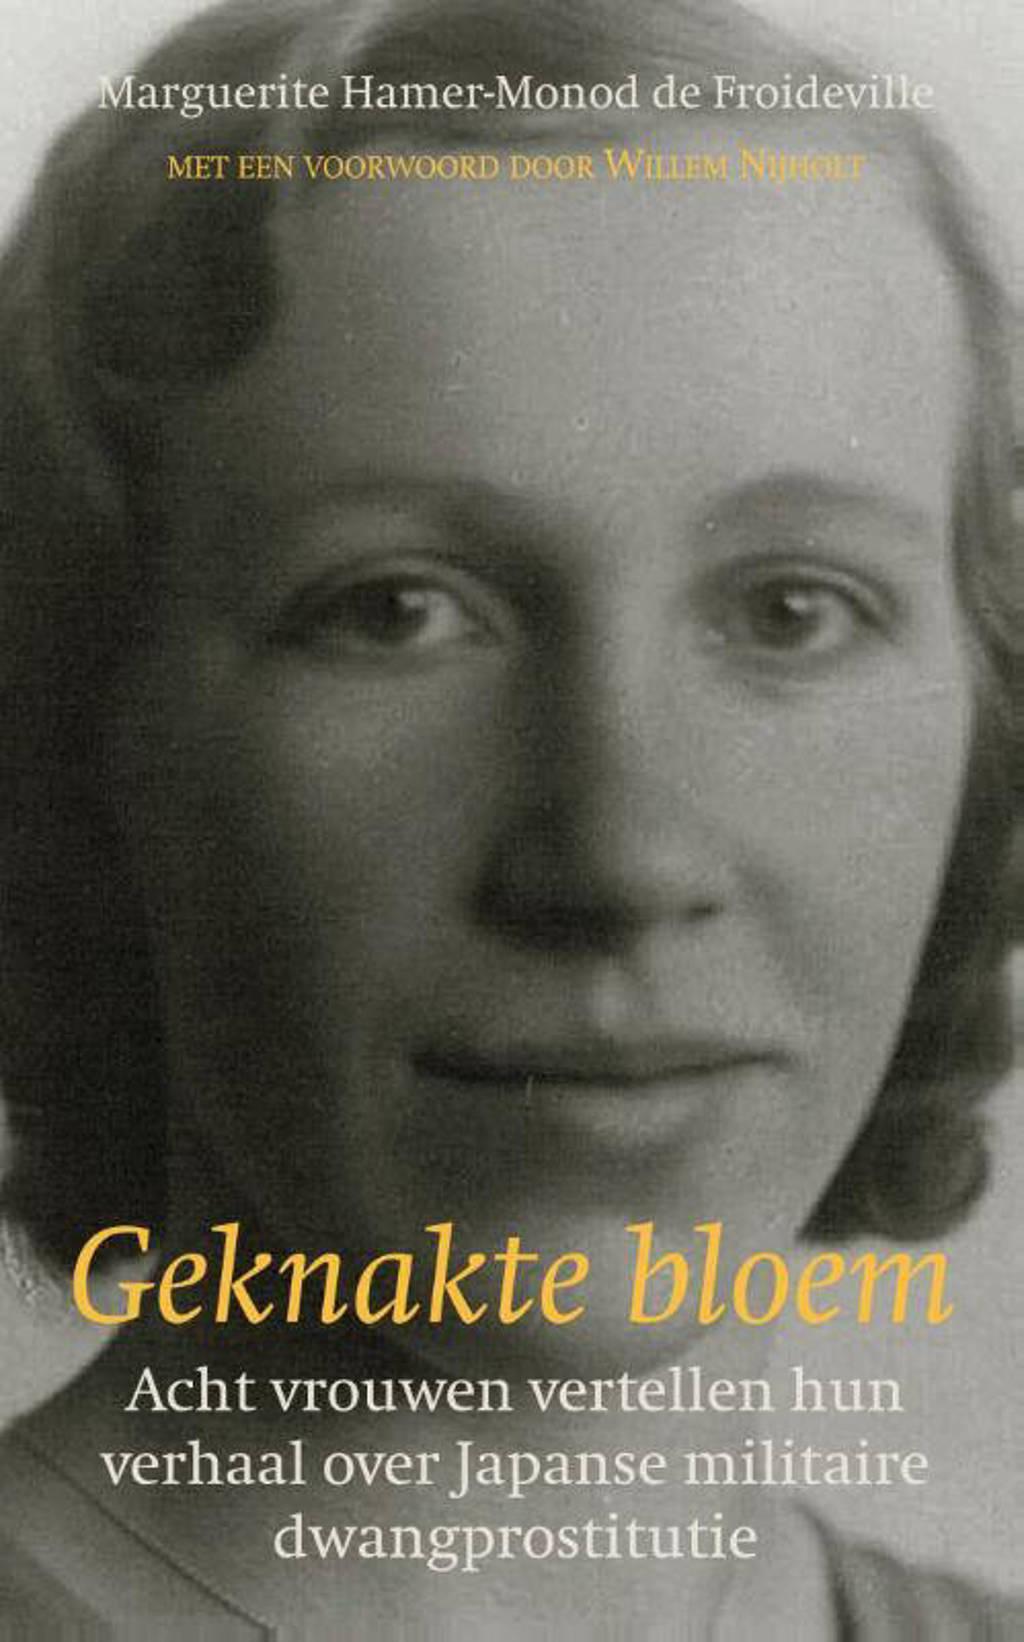 Geknakte bloem - Marguerite Hamer-Monod de Froideville